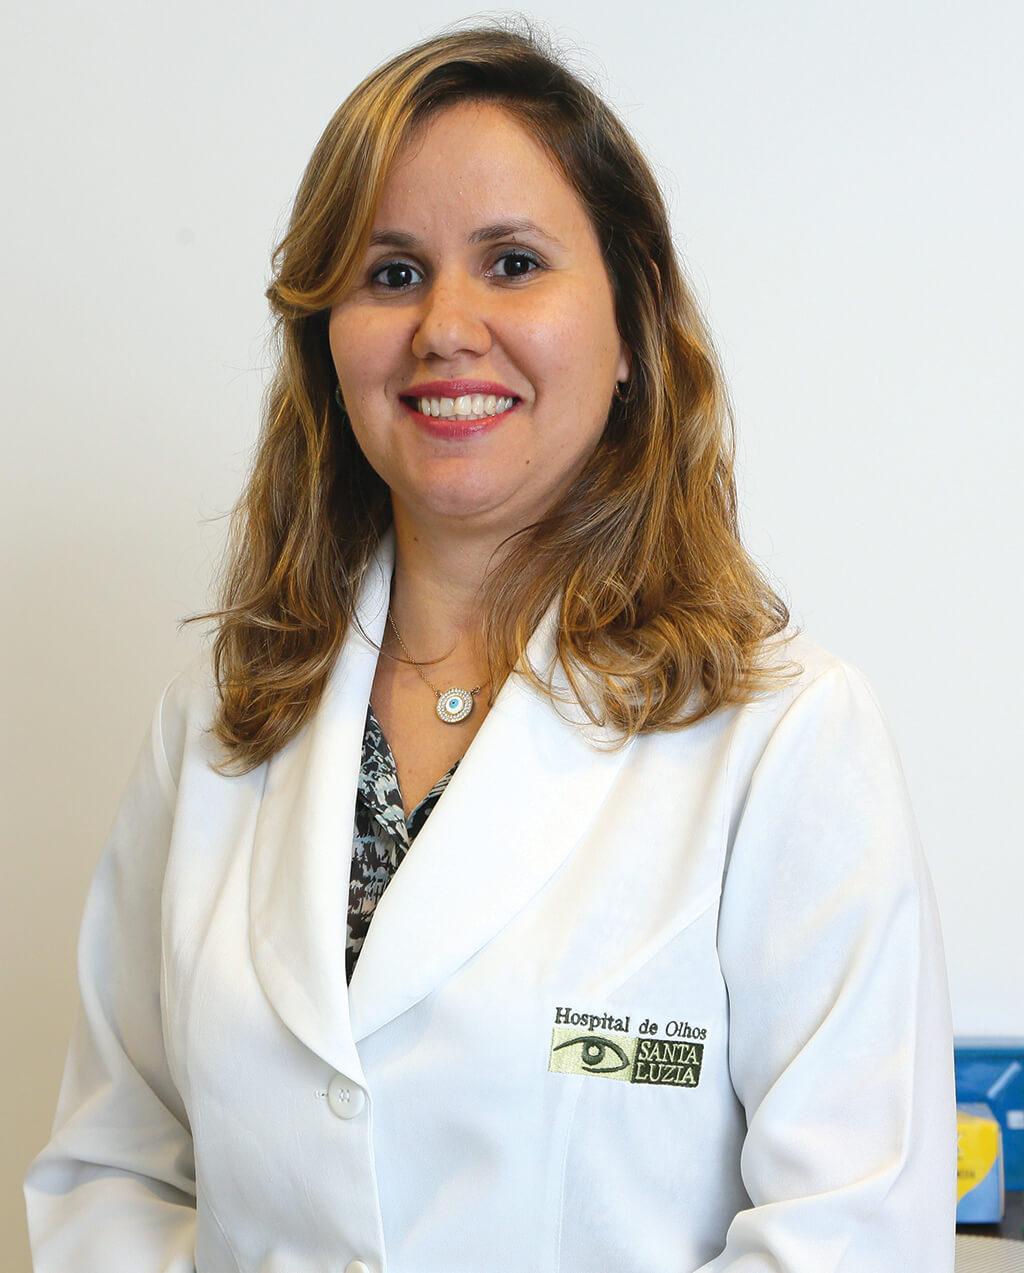 Patricia Rego